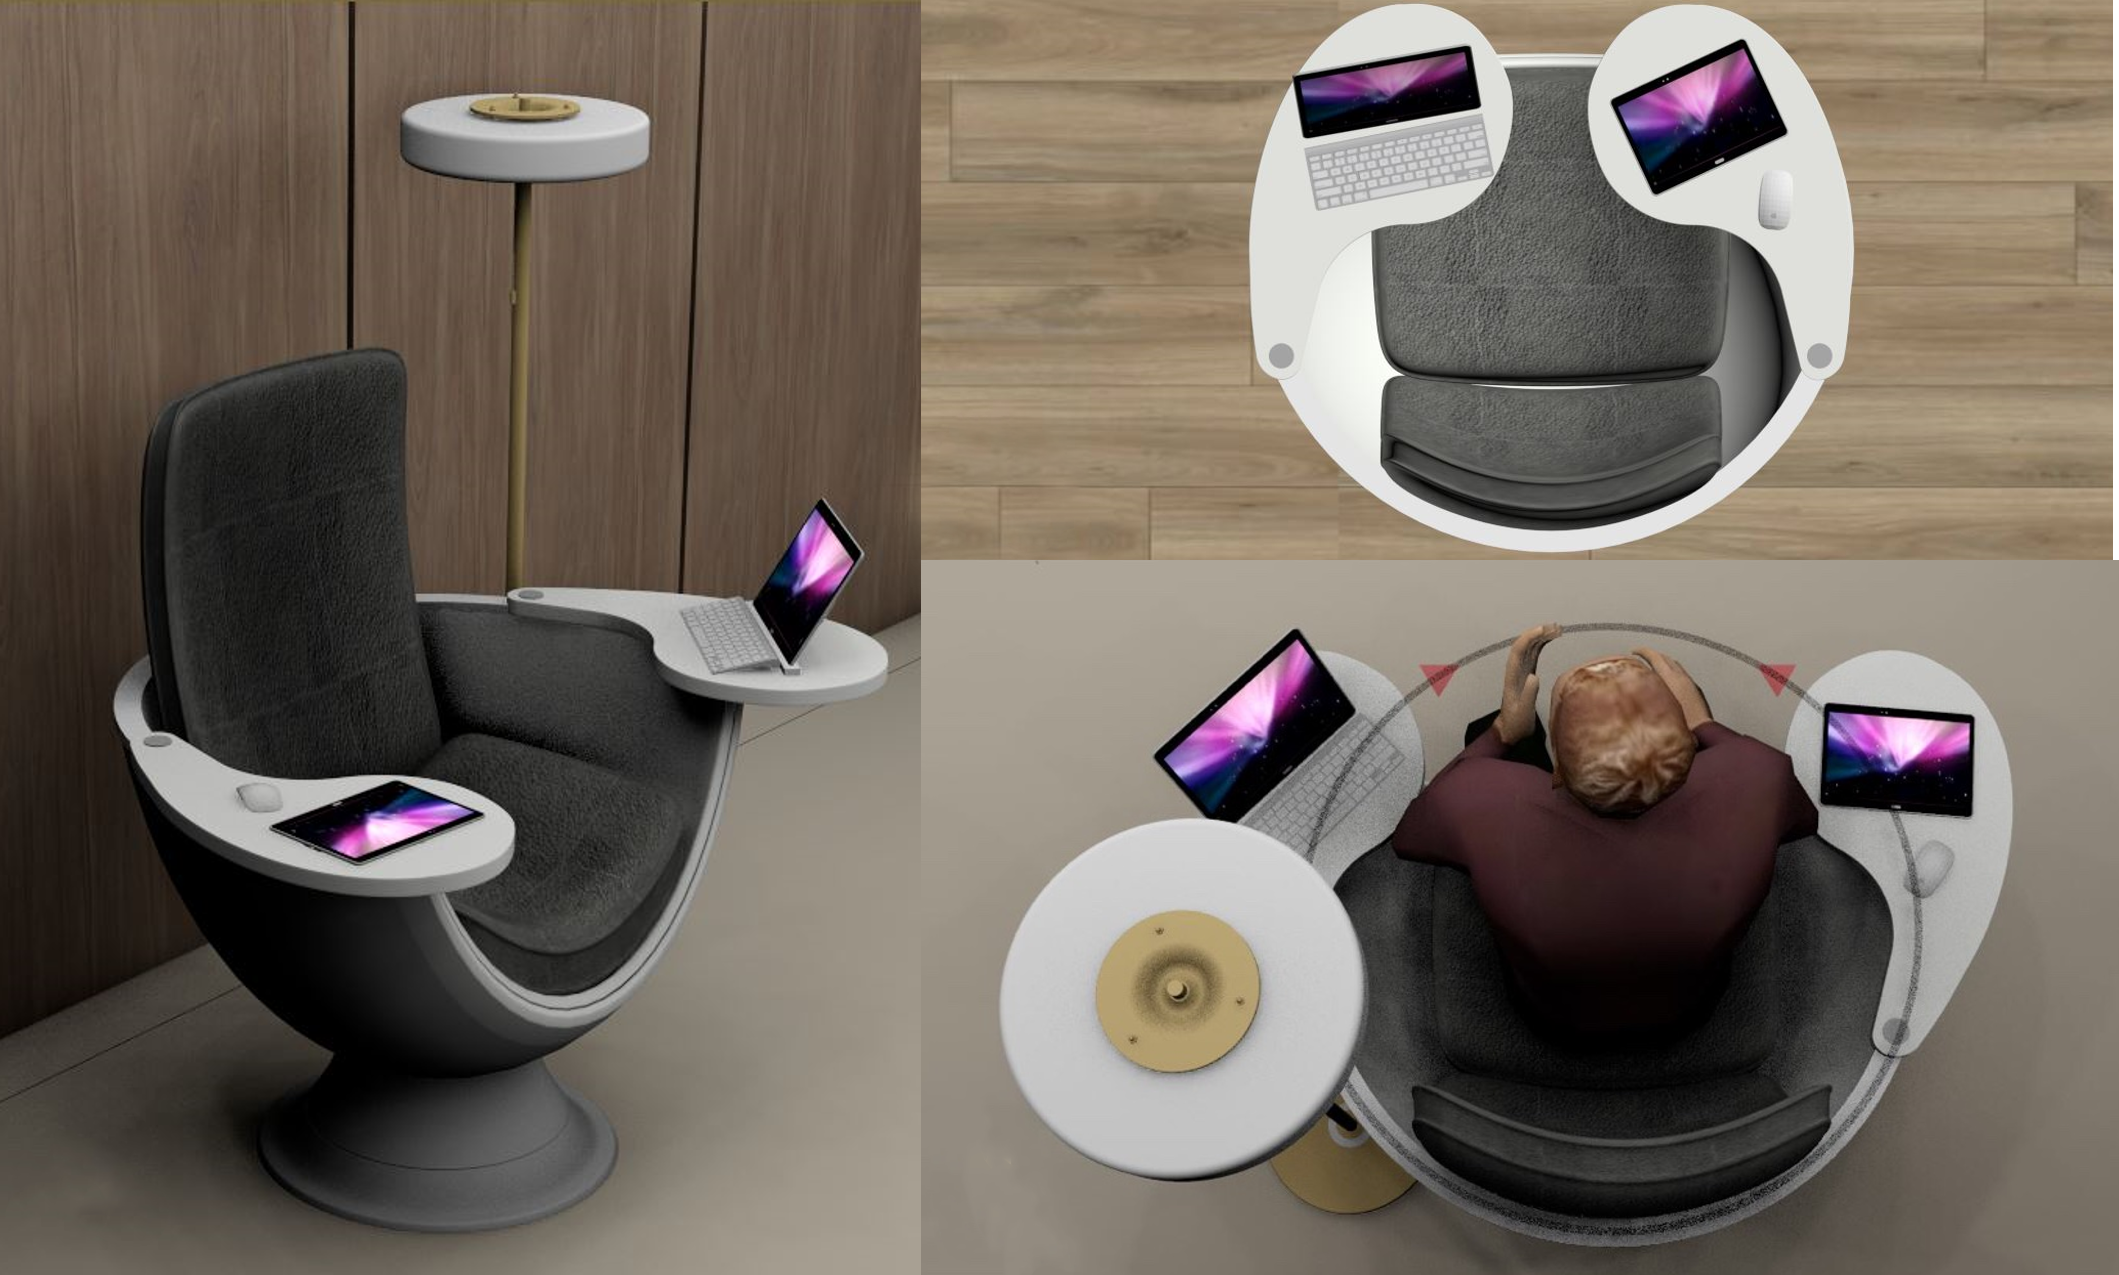 3D Representation of the Lector Podium